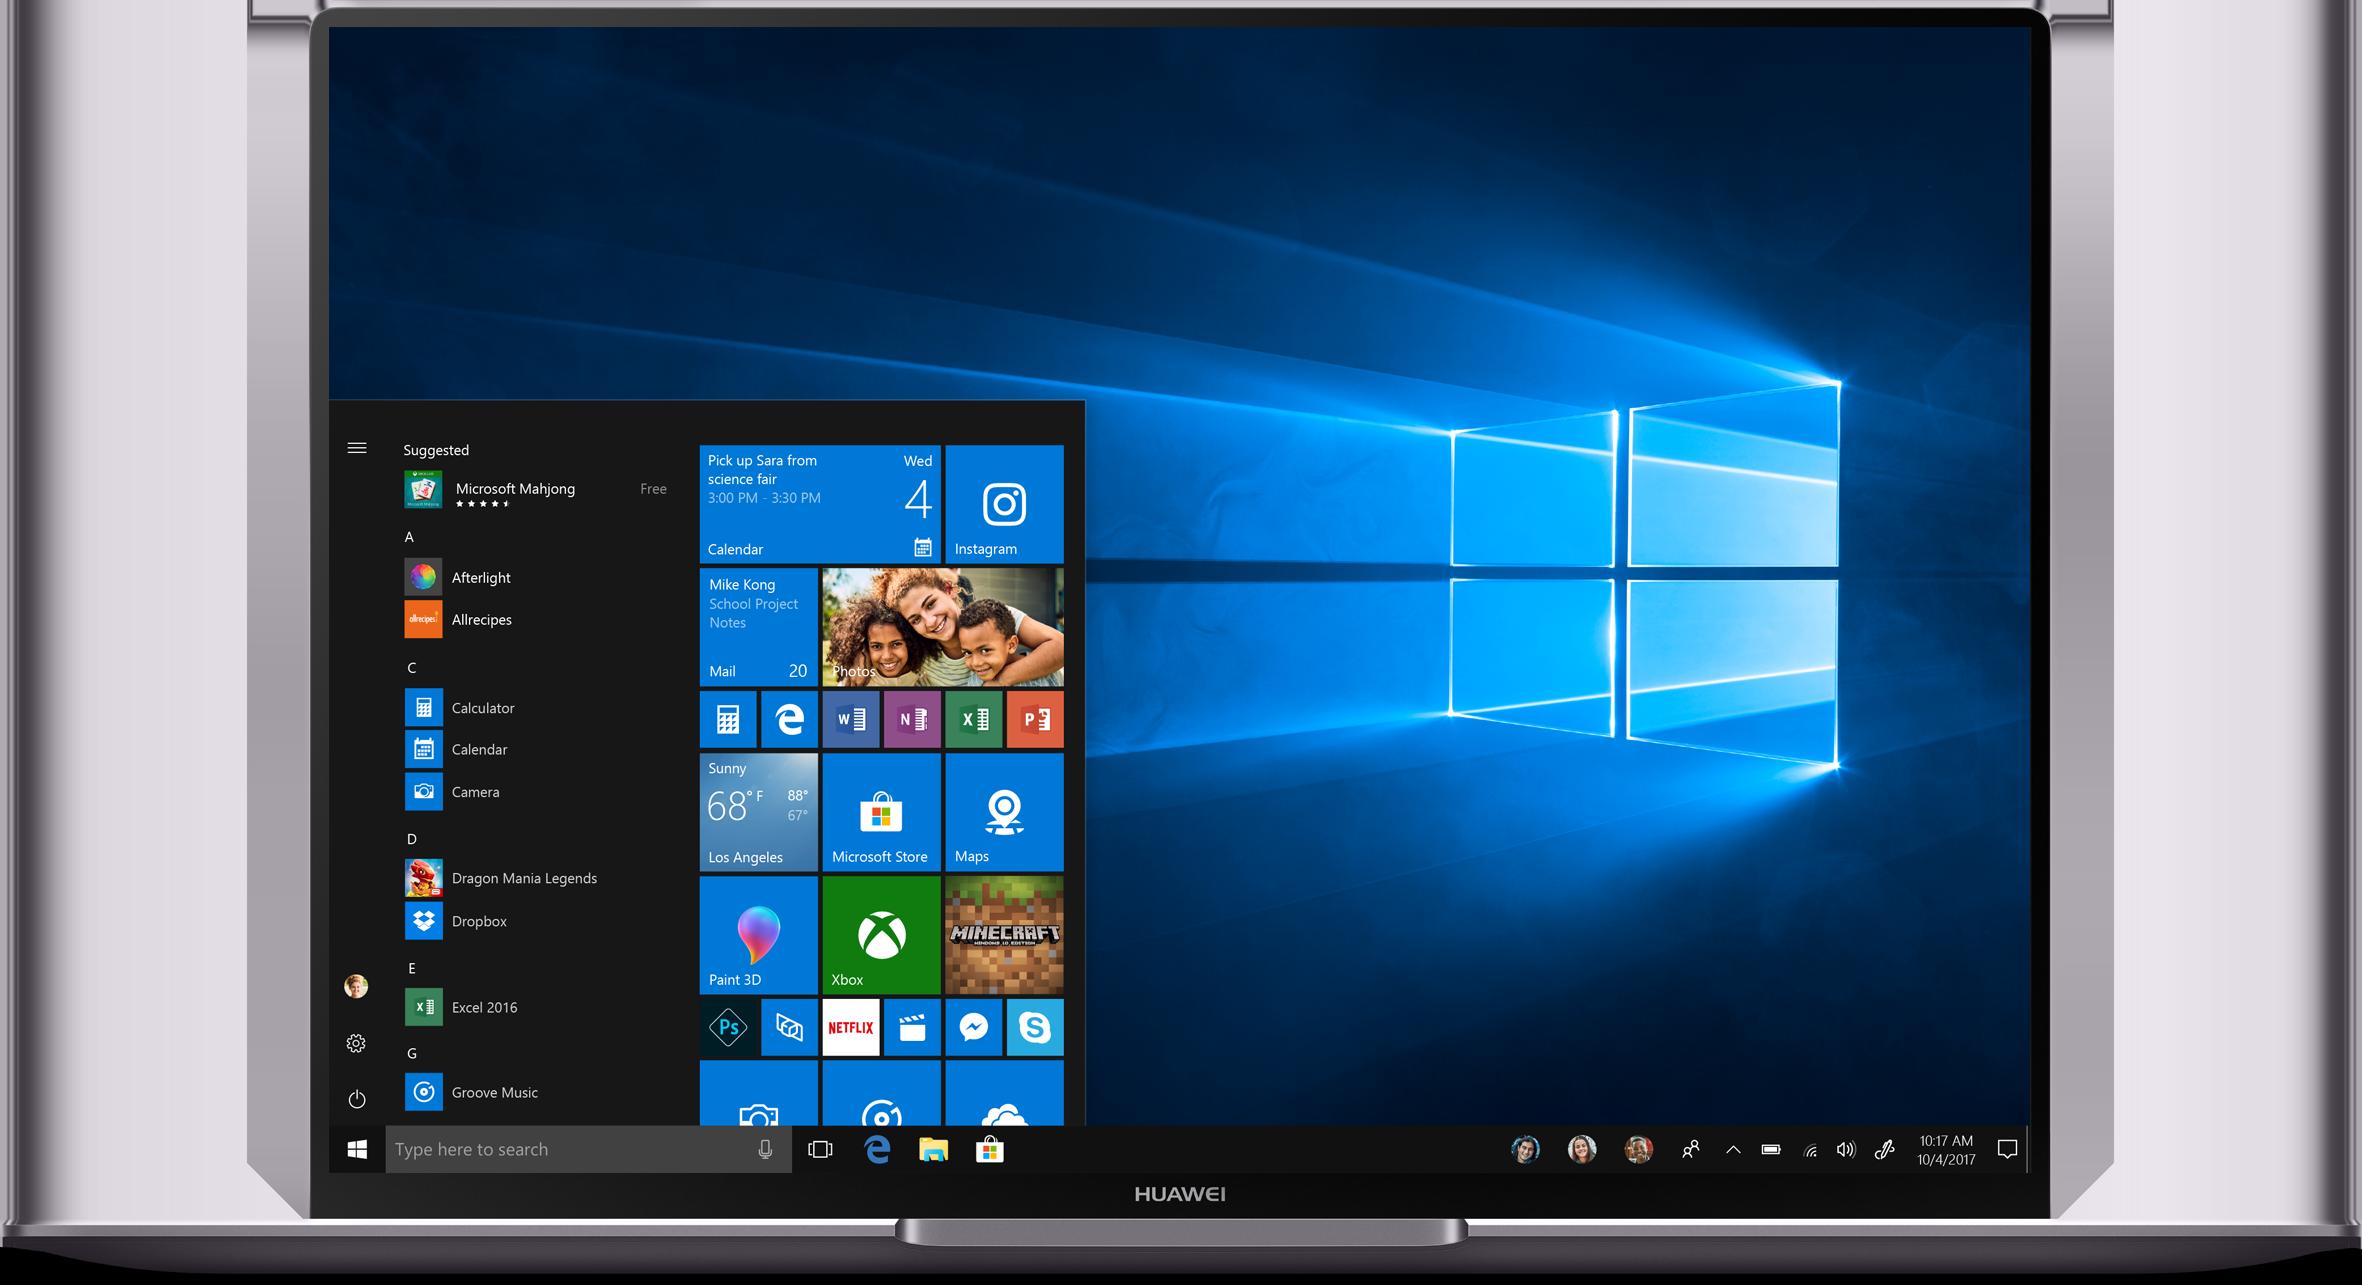 Buy Huawei Matebook X Pro Laptop - Microsoft Store